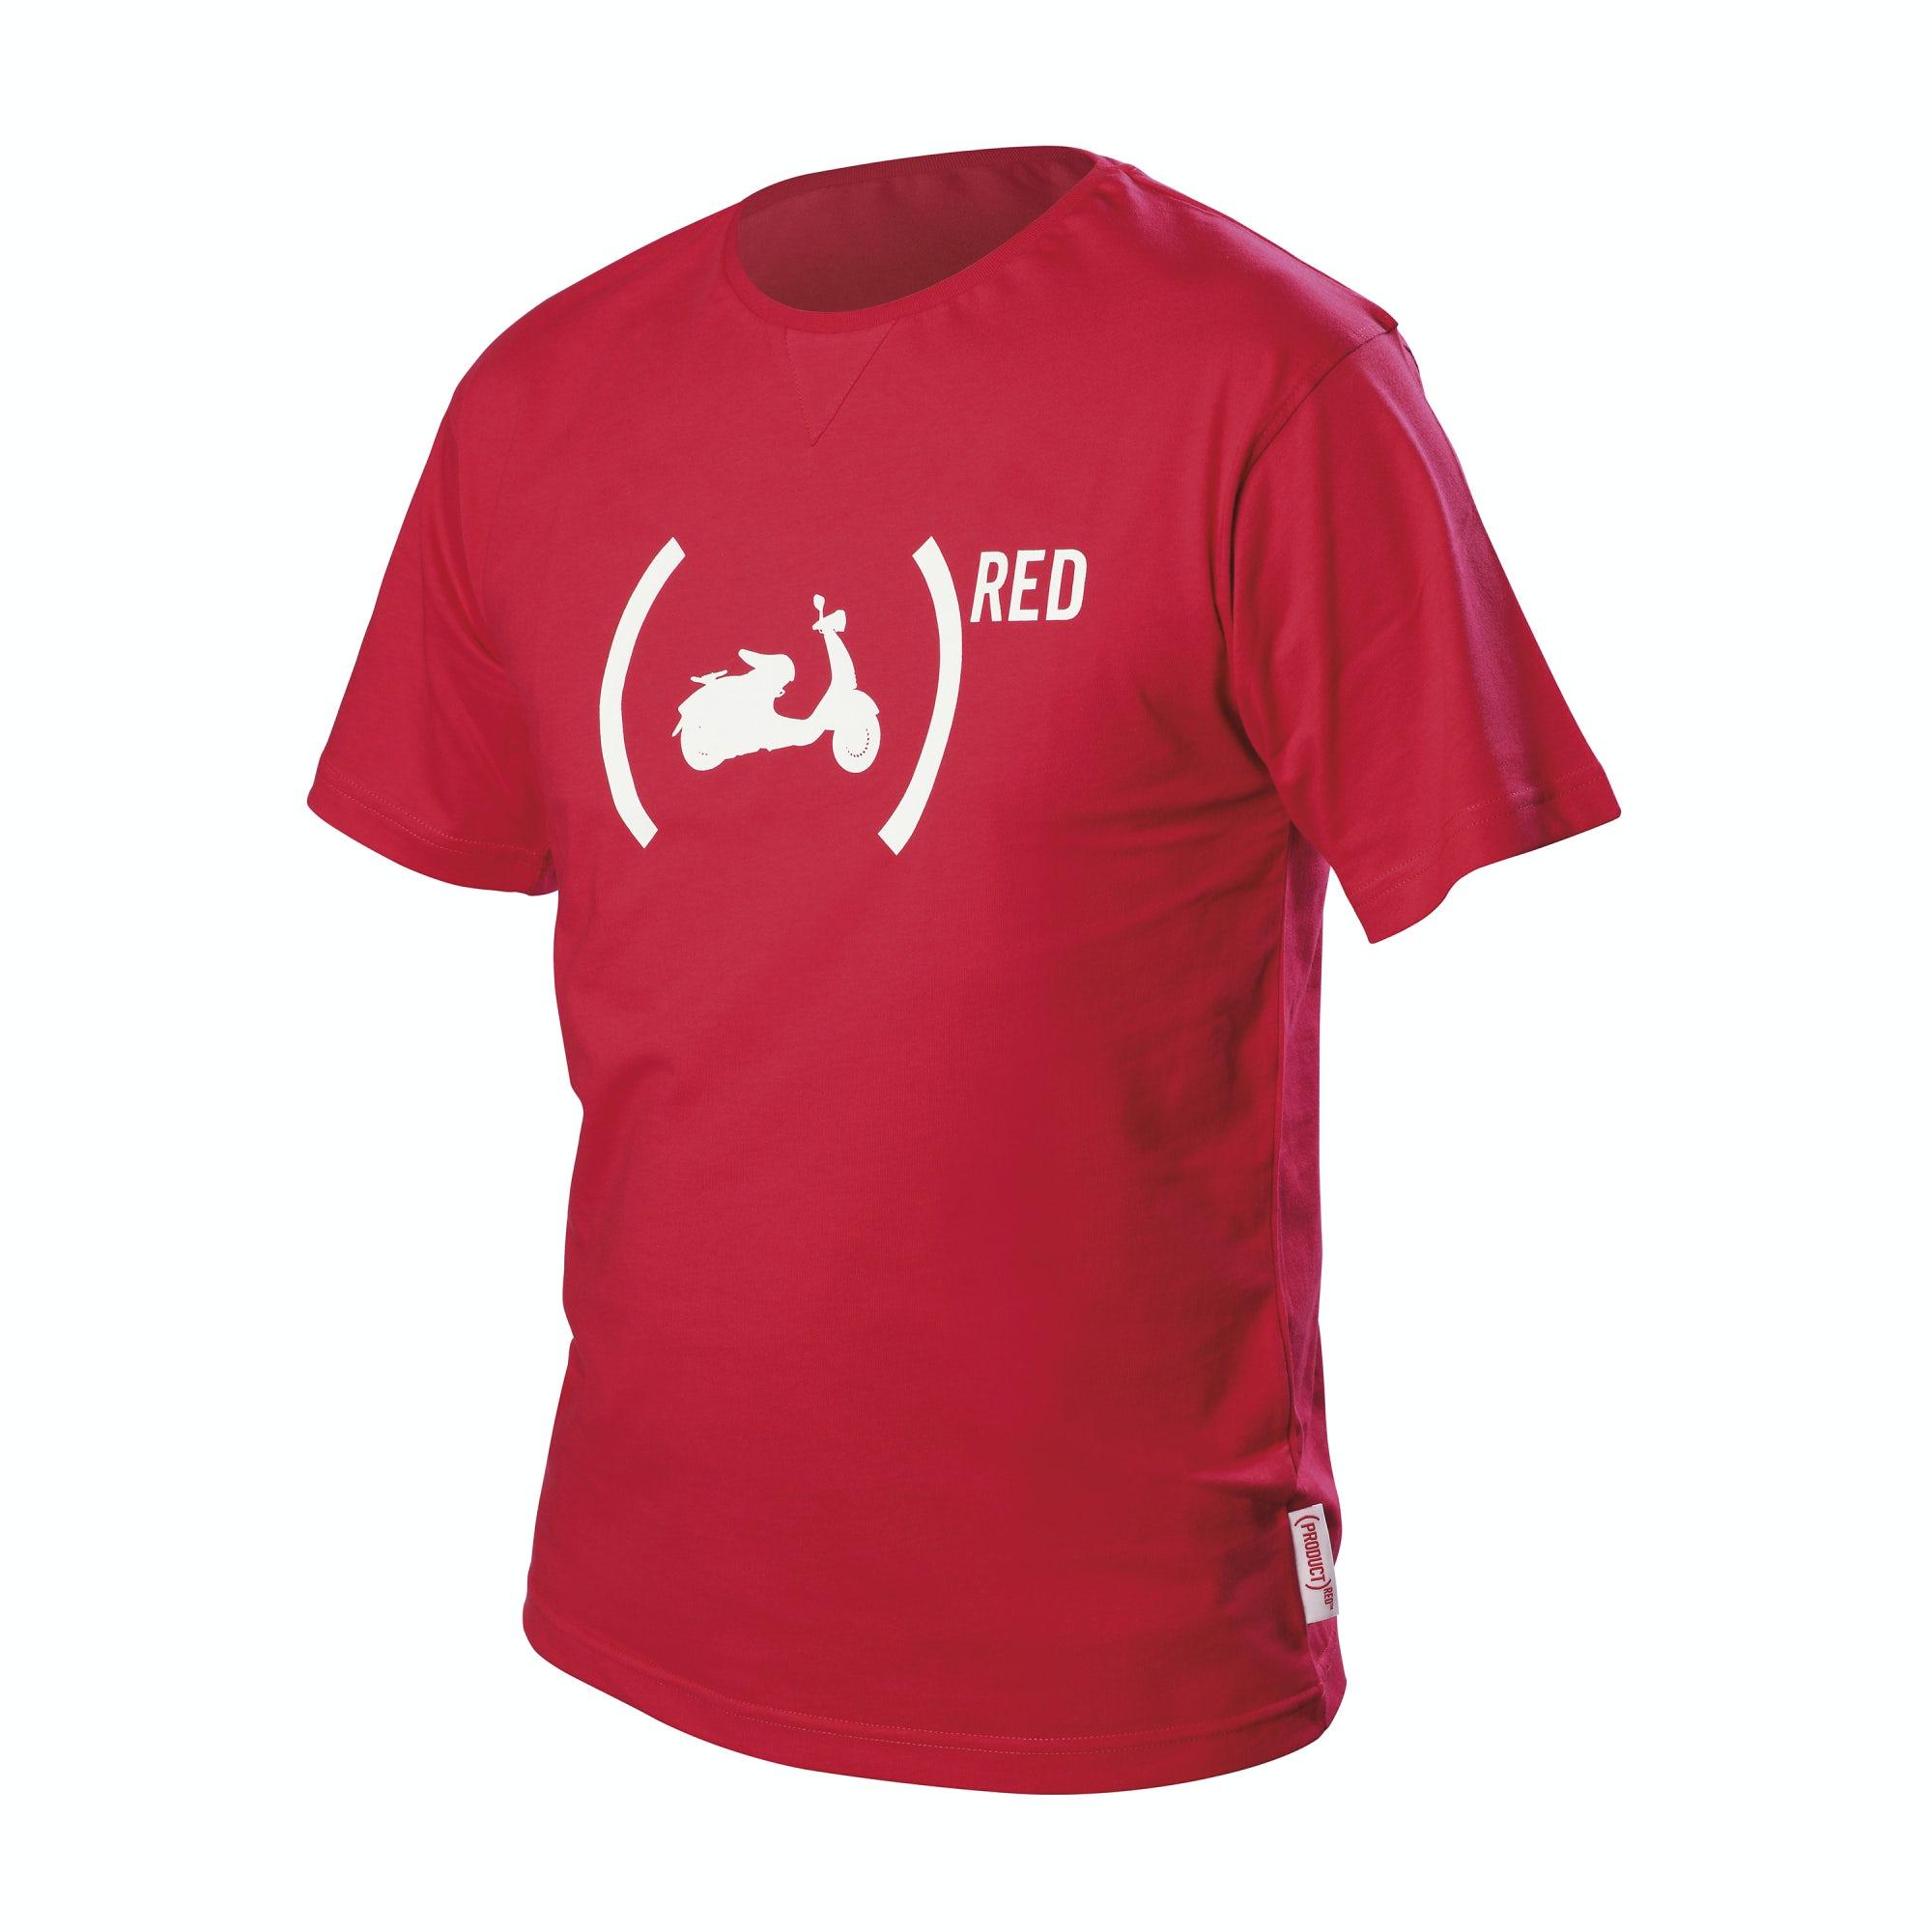 t shirt vespa 946 red t shirts clothing. Black Bedroom Furniture Sets. Home Design Ideas